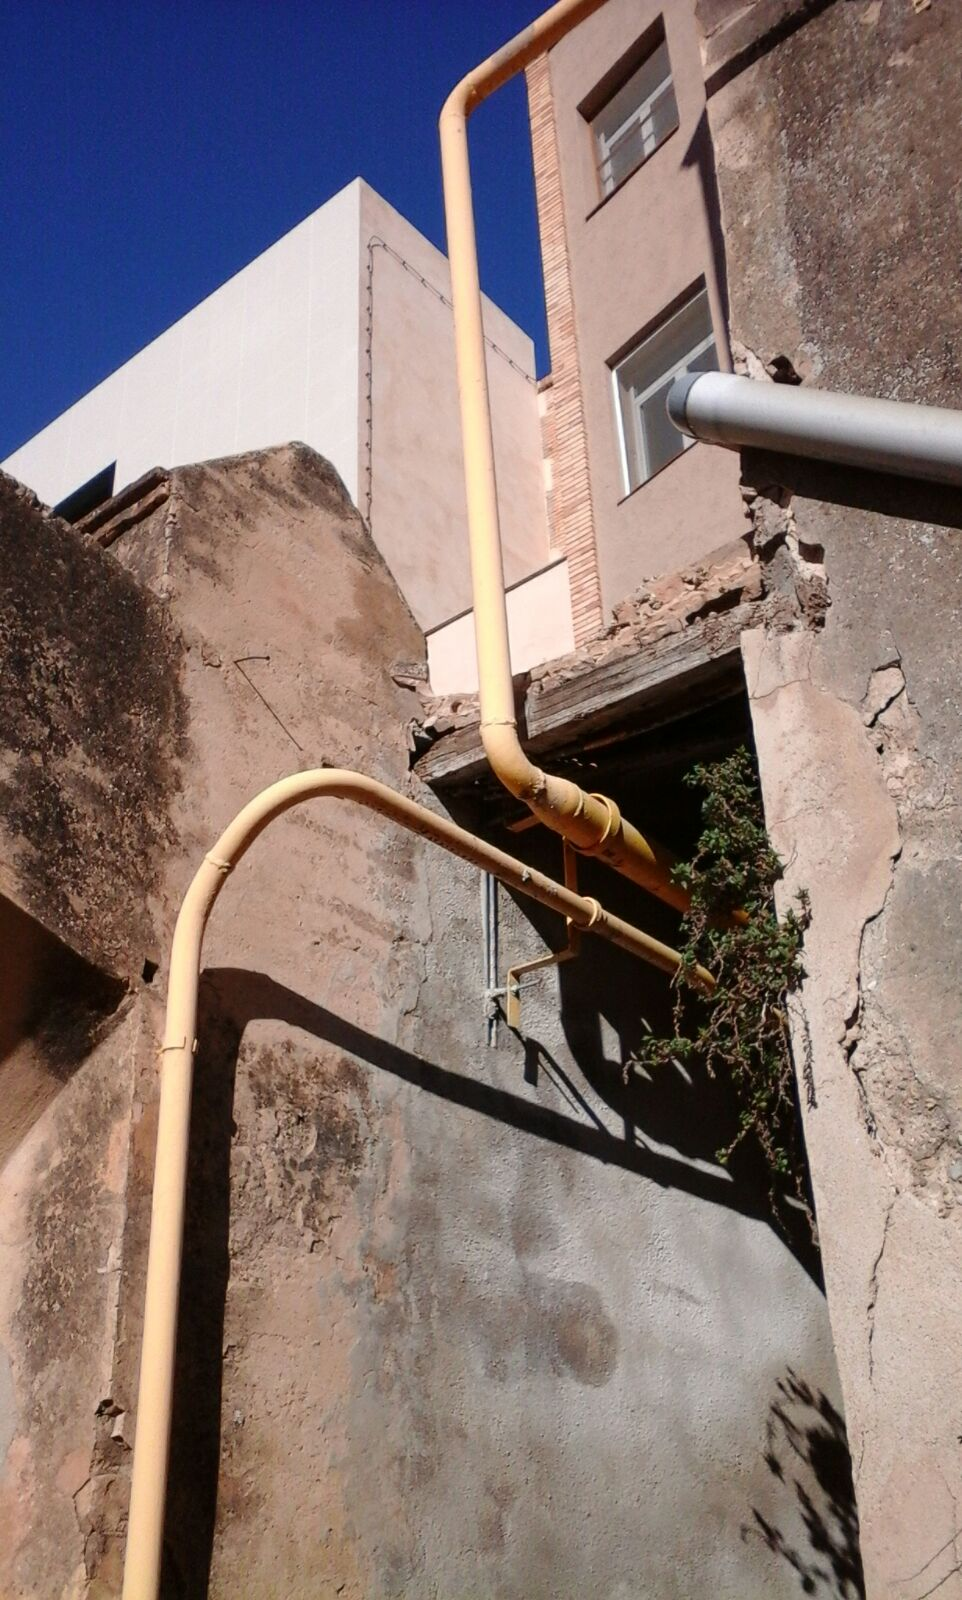 tuberia de gas de la residencia Sant Miquel